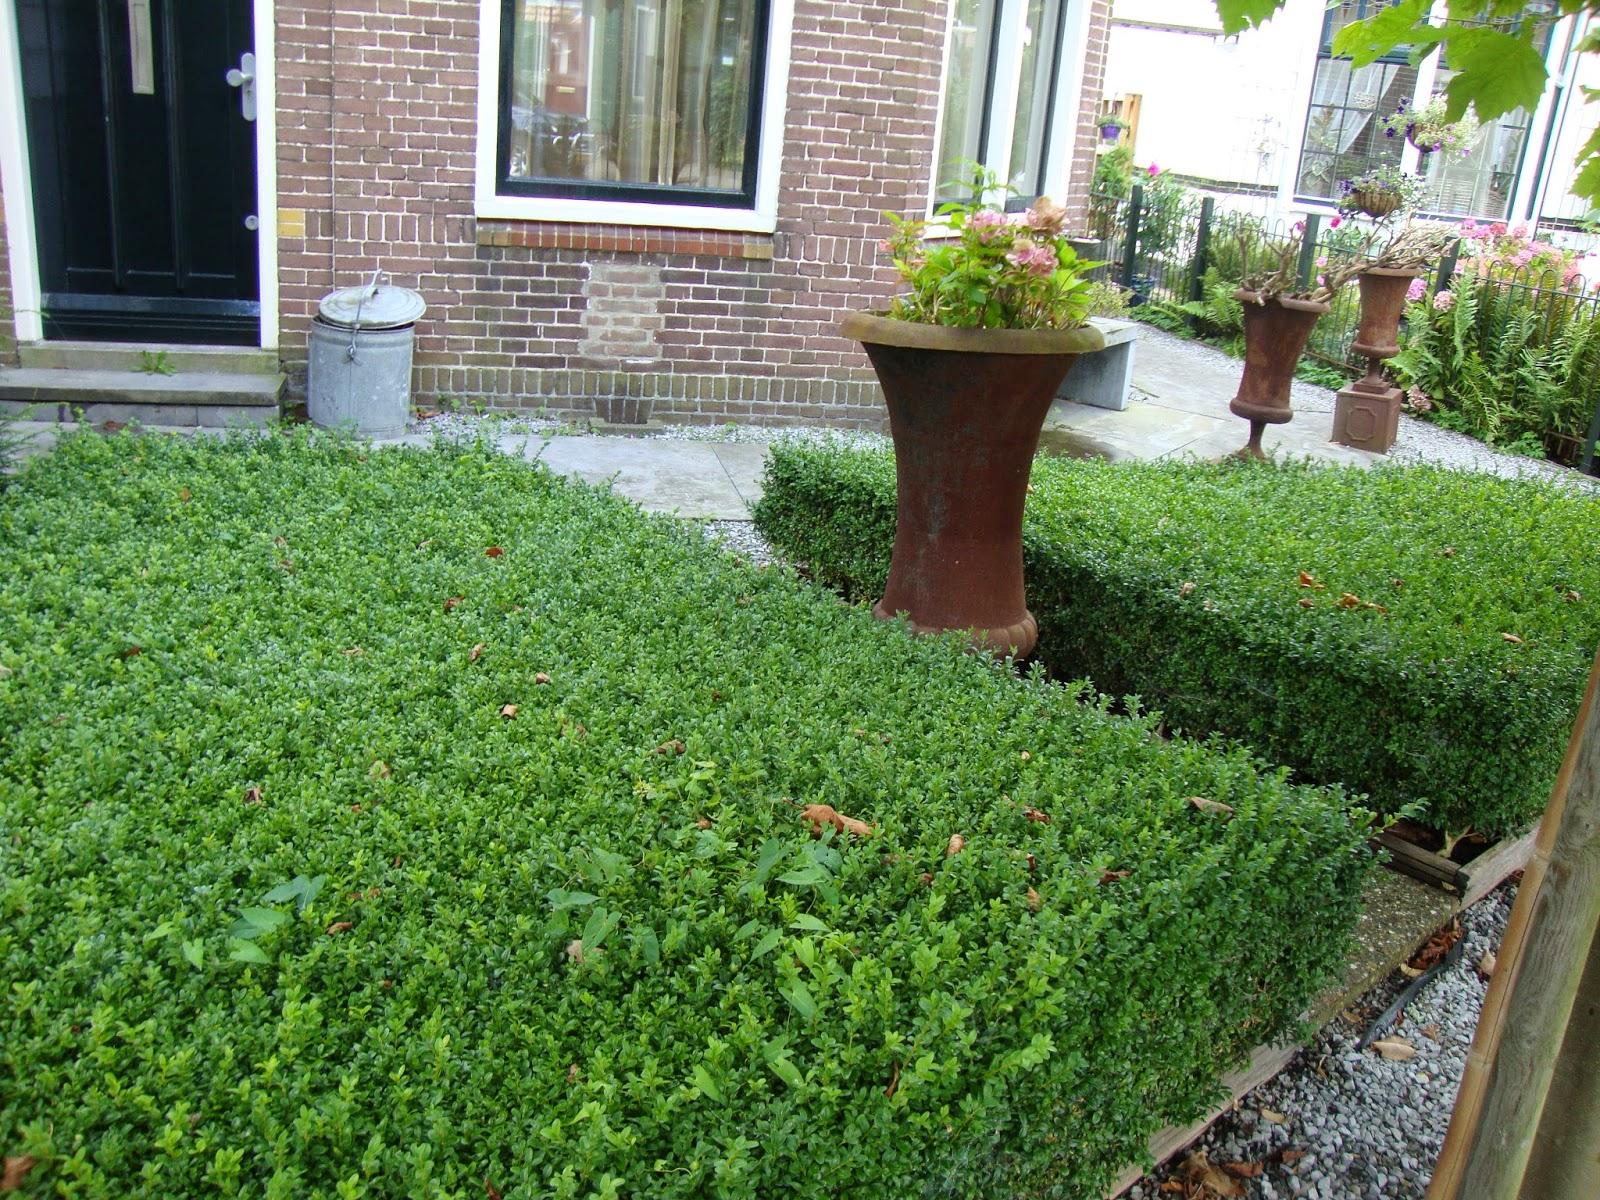 Piccoli giardini olandesi 2 for Immagini piccoli giardini